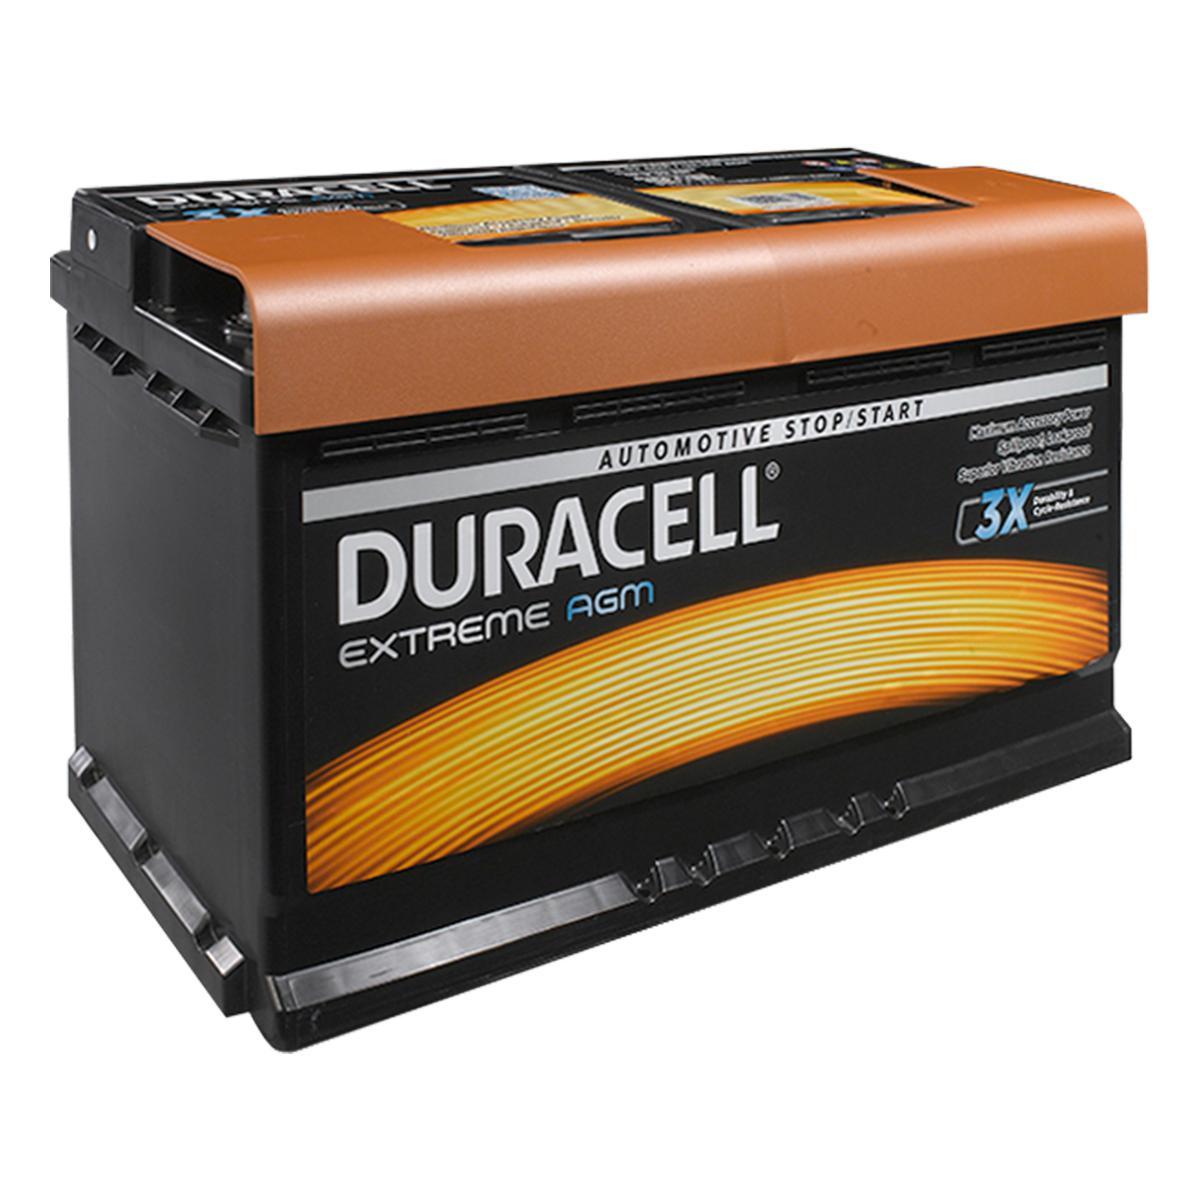 Duracell 019 / DE92 AGM Extreme Car Battery